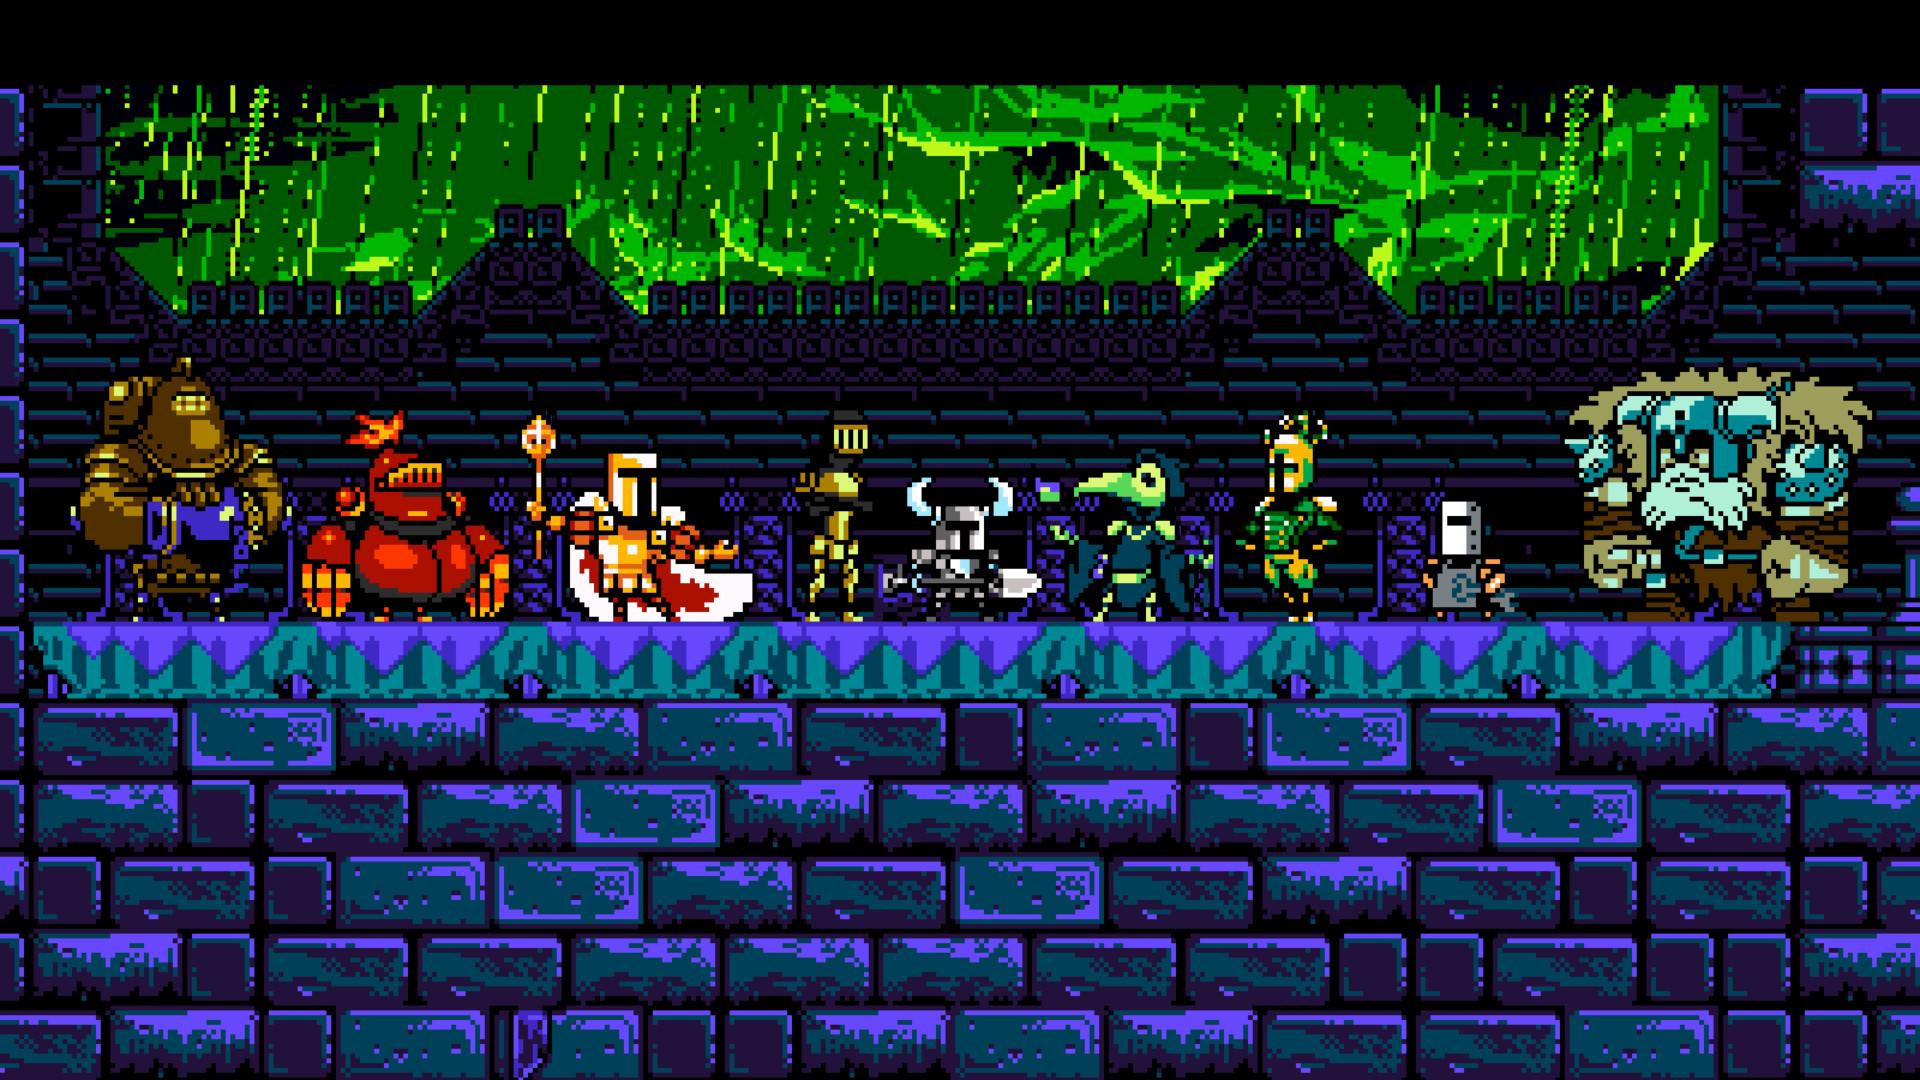 General Shovel Knight video games pixel art retro games 8-bit  16-bit